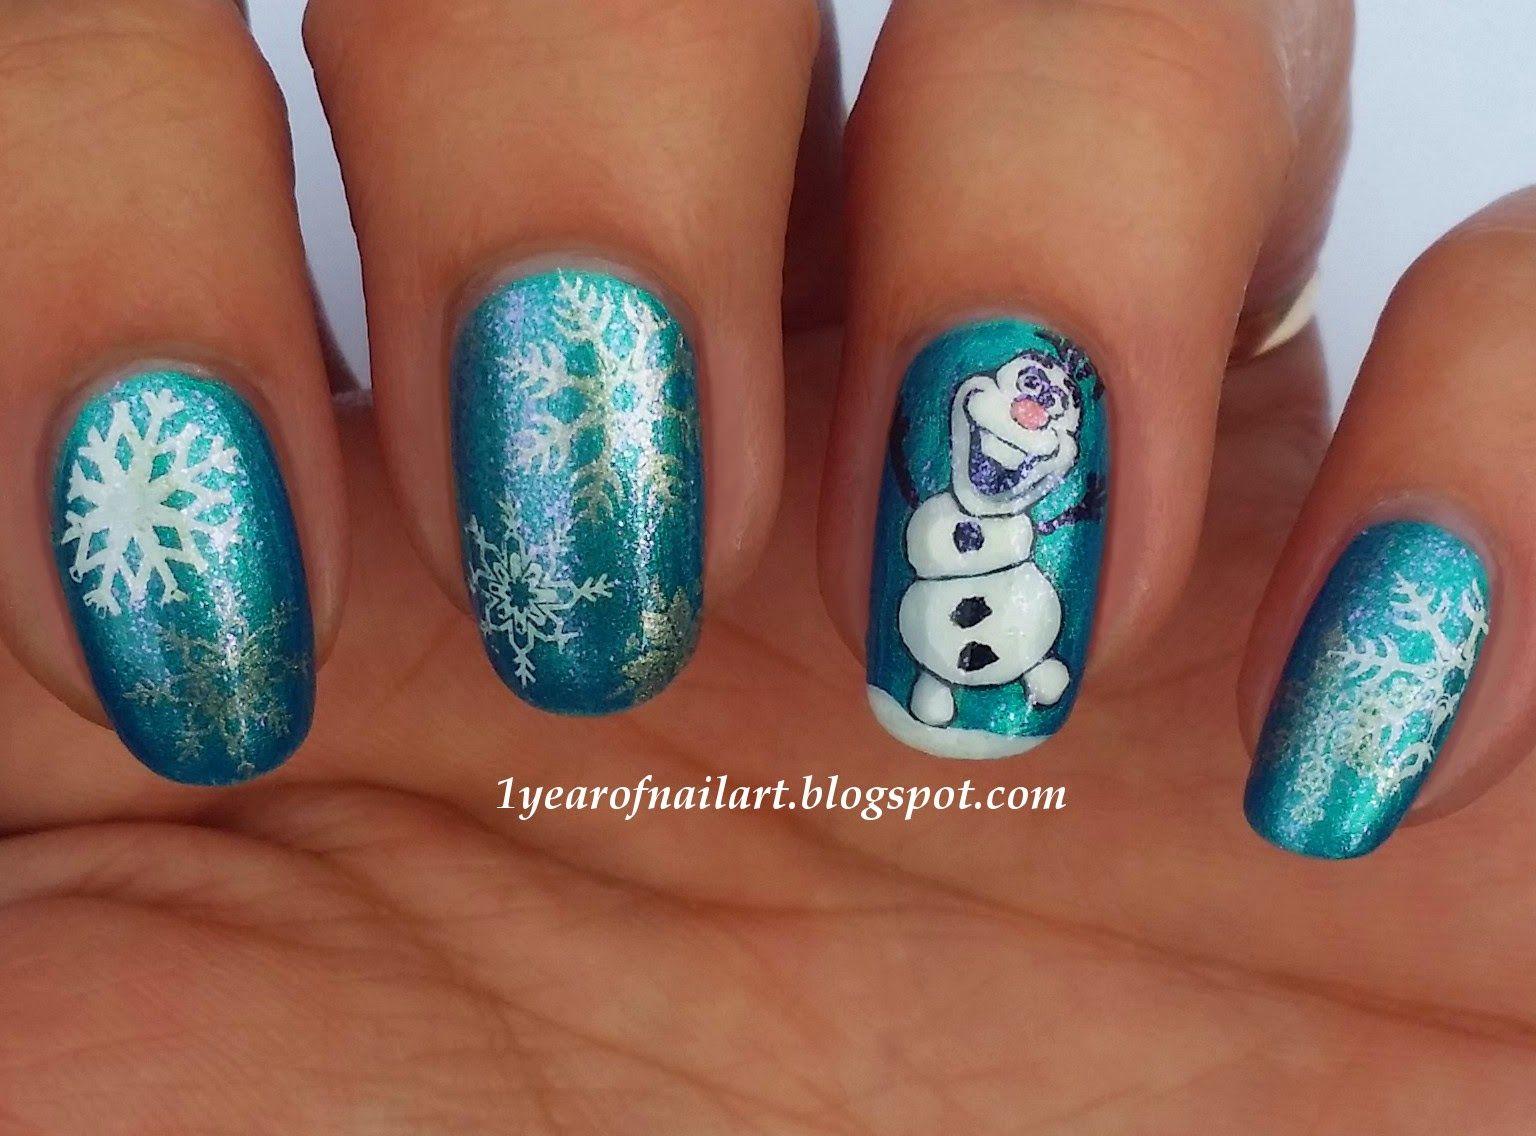 Frozen Olaf nail art 1yearofnailart.blogspot.com | Frozen ...